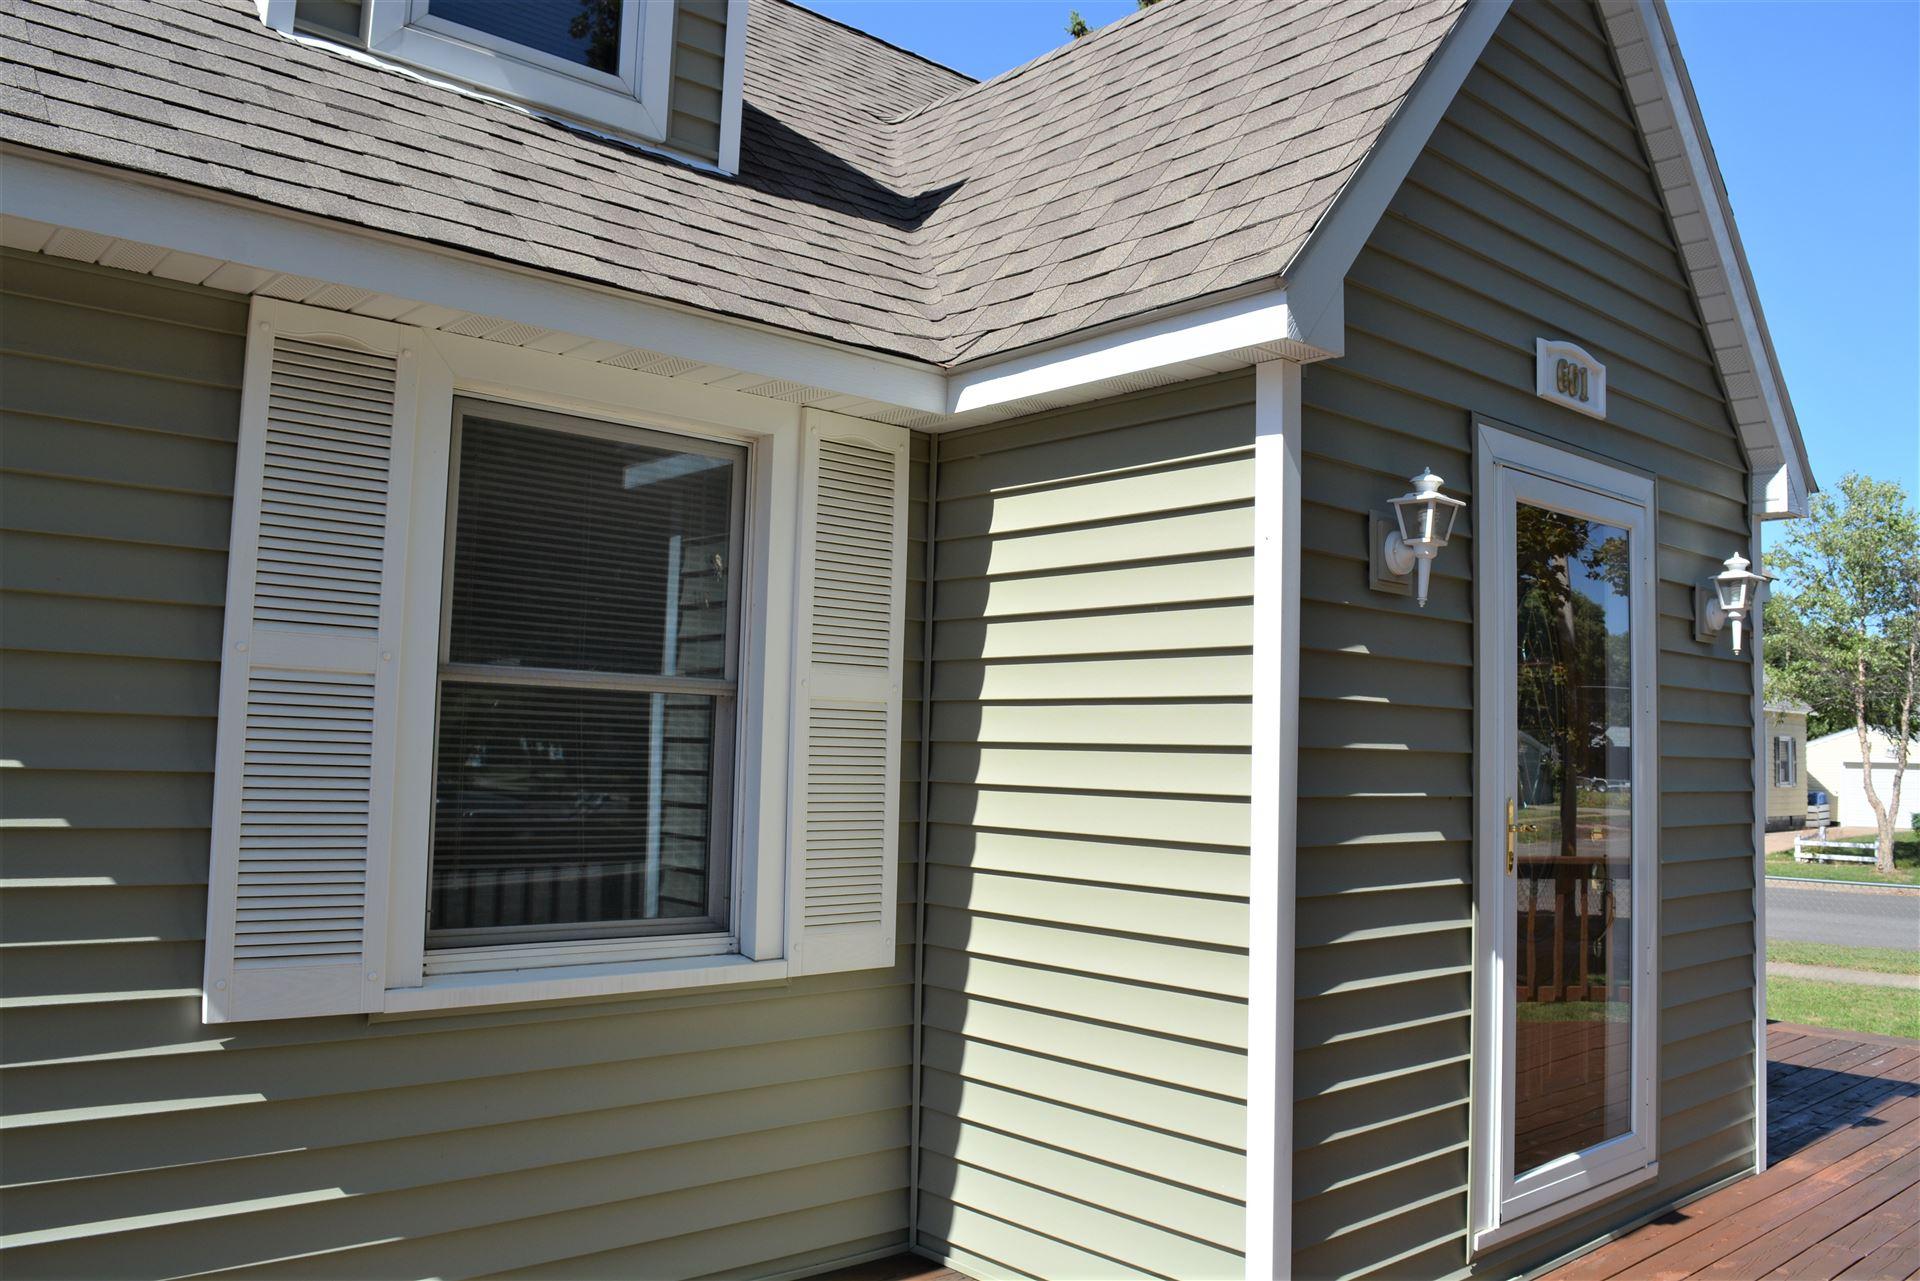 601 Carimona Street, Winona, MN 55987 - MLS#: 5652030